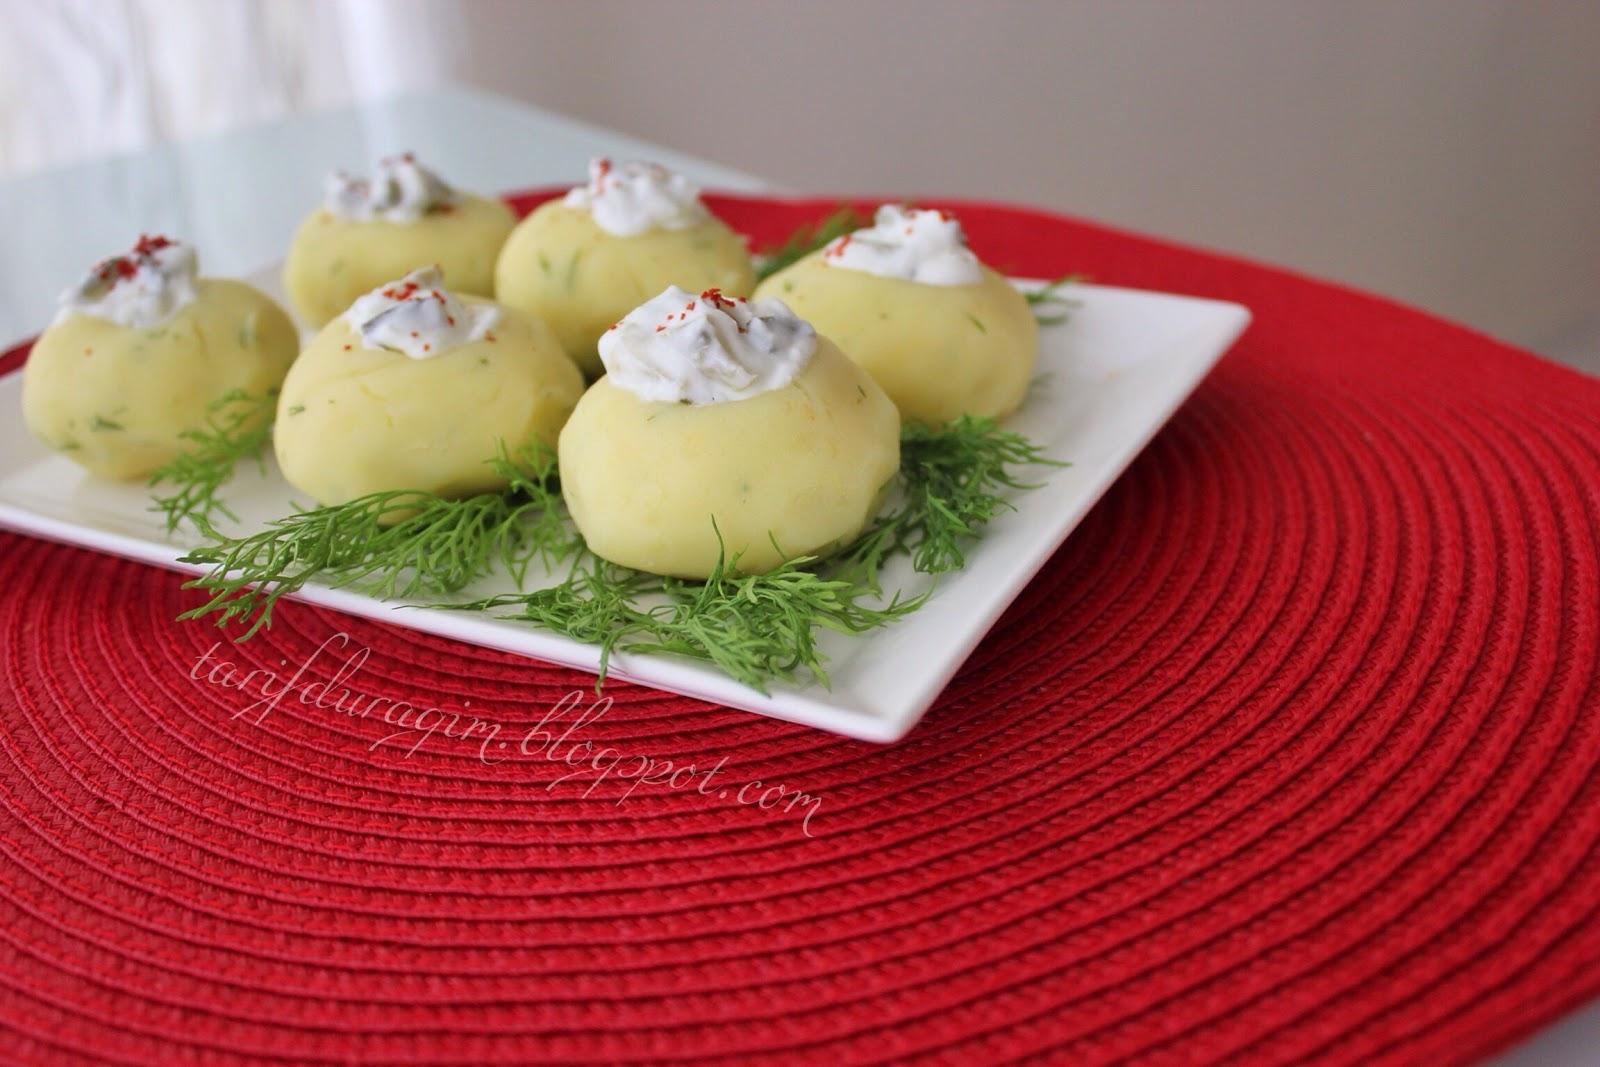 Yoğurtlu patates çanağı tarifi